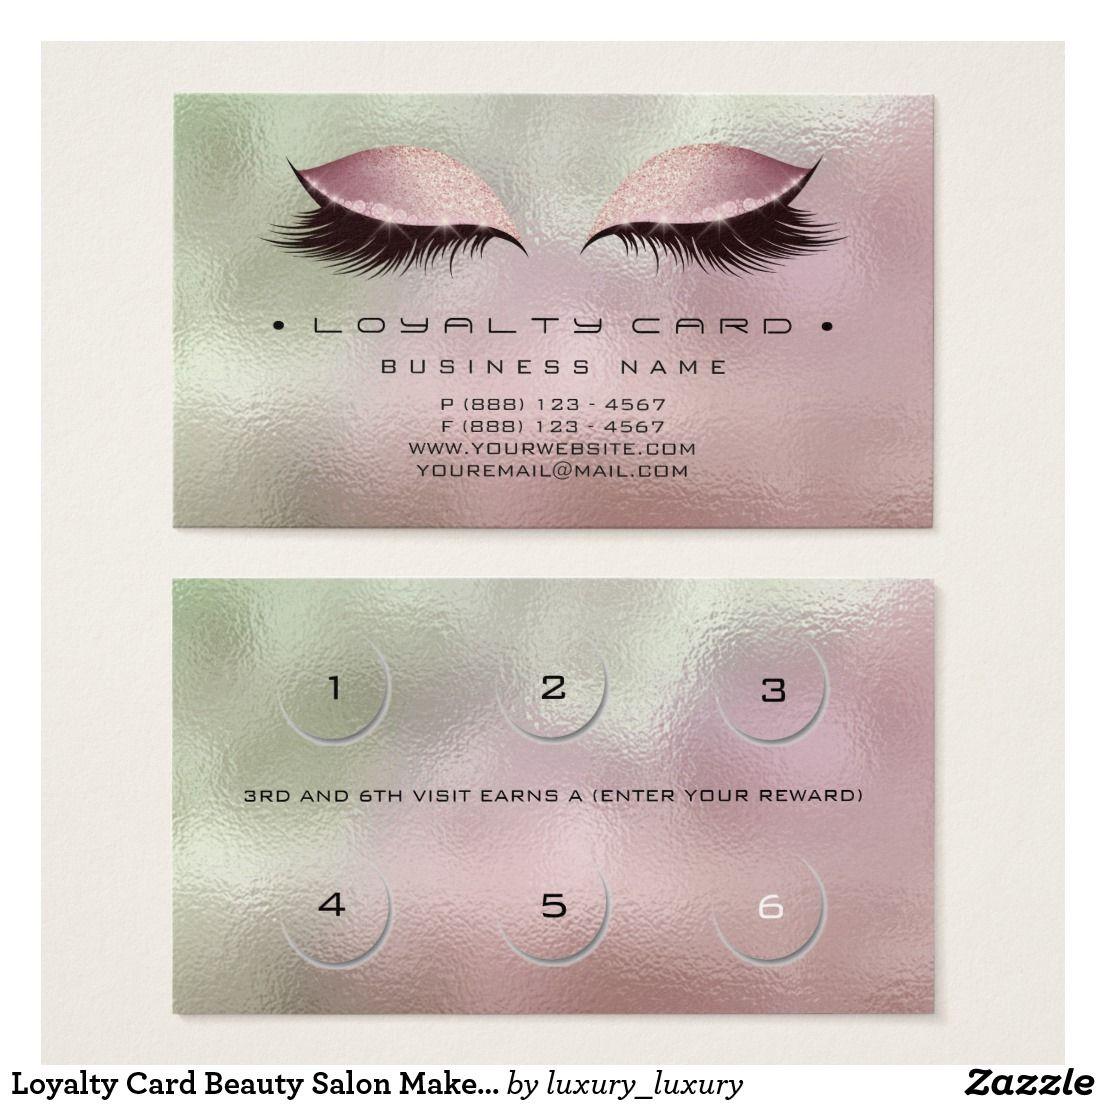 Loyalty Card Beauty Salon Makeup Copper Rose Mint